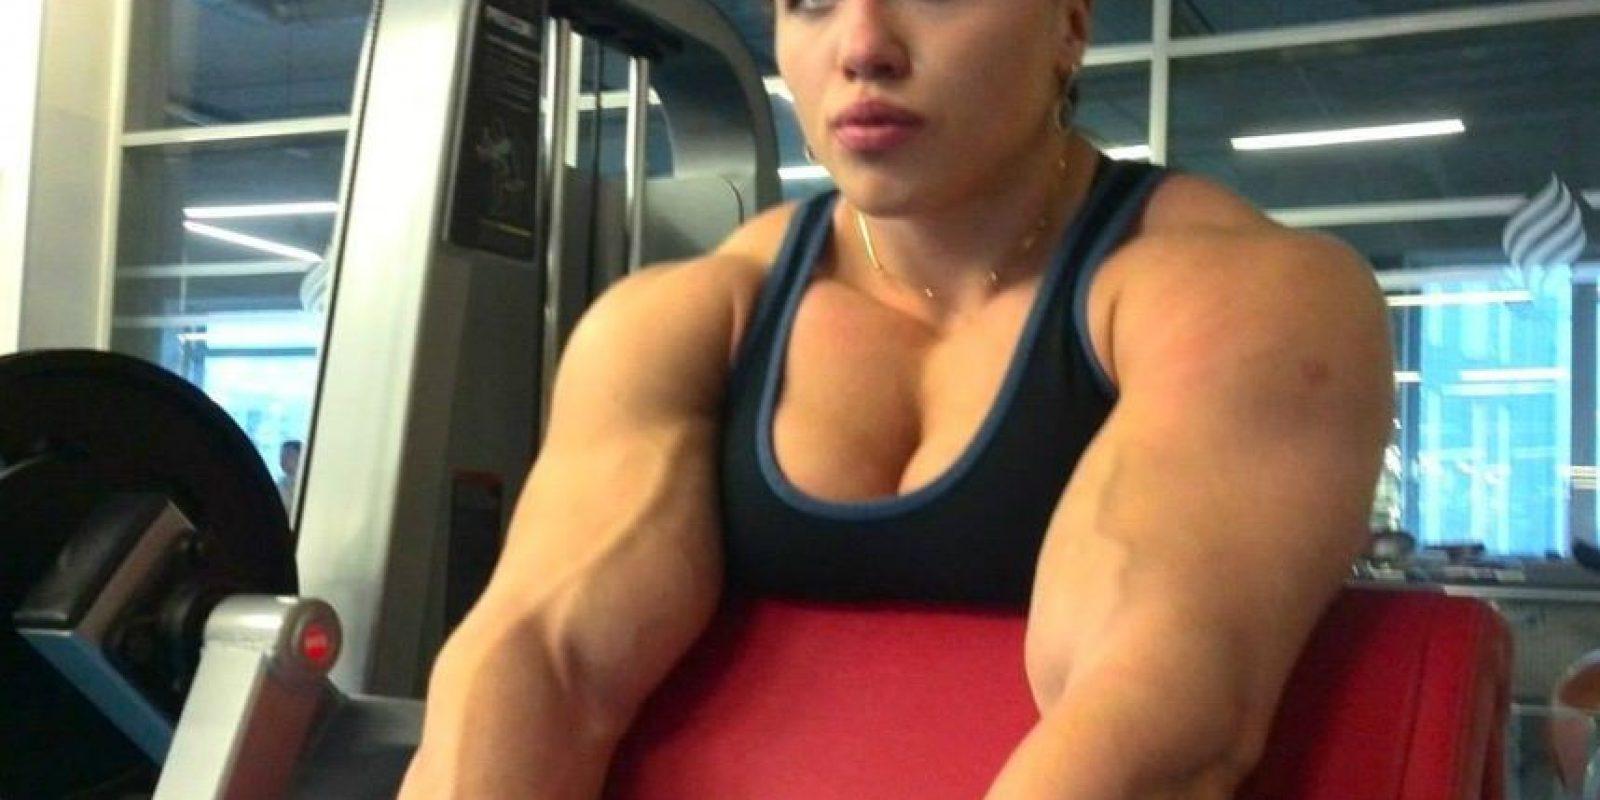 Ella es Natalya Trukhina. Foto:Vía facebook.com/robert.smyth.94